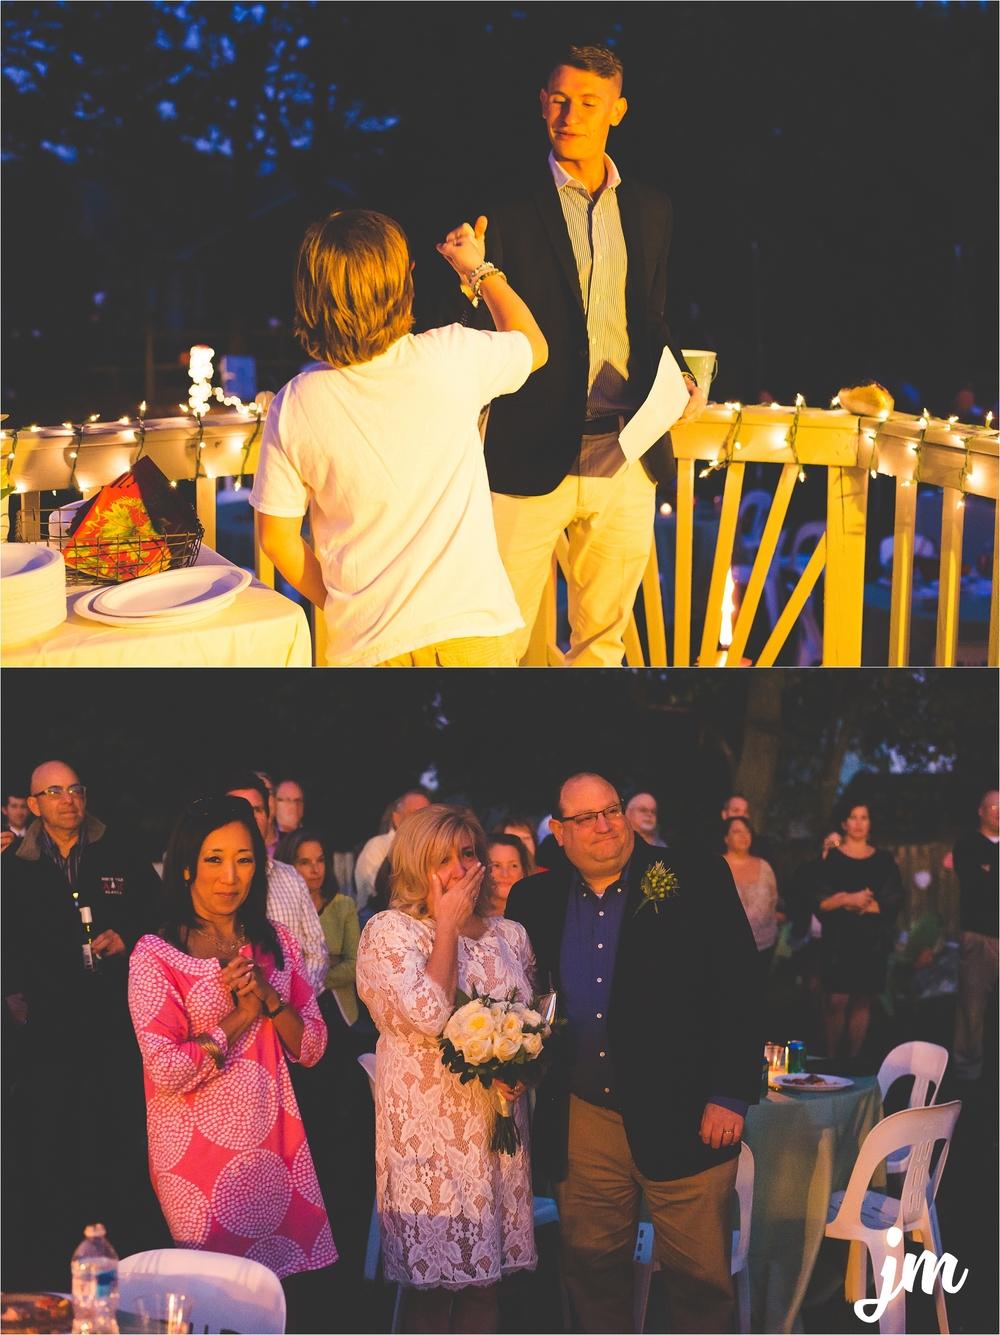 backyard-wedding-pacific-northwest-photographer-jannicka-mayte_0048.jpg